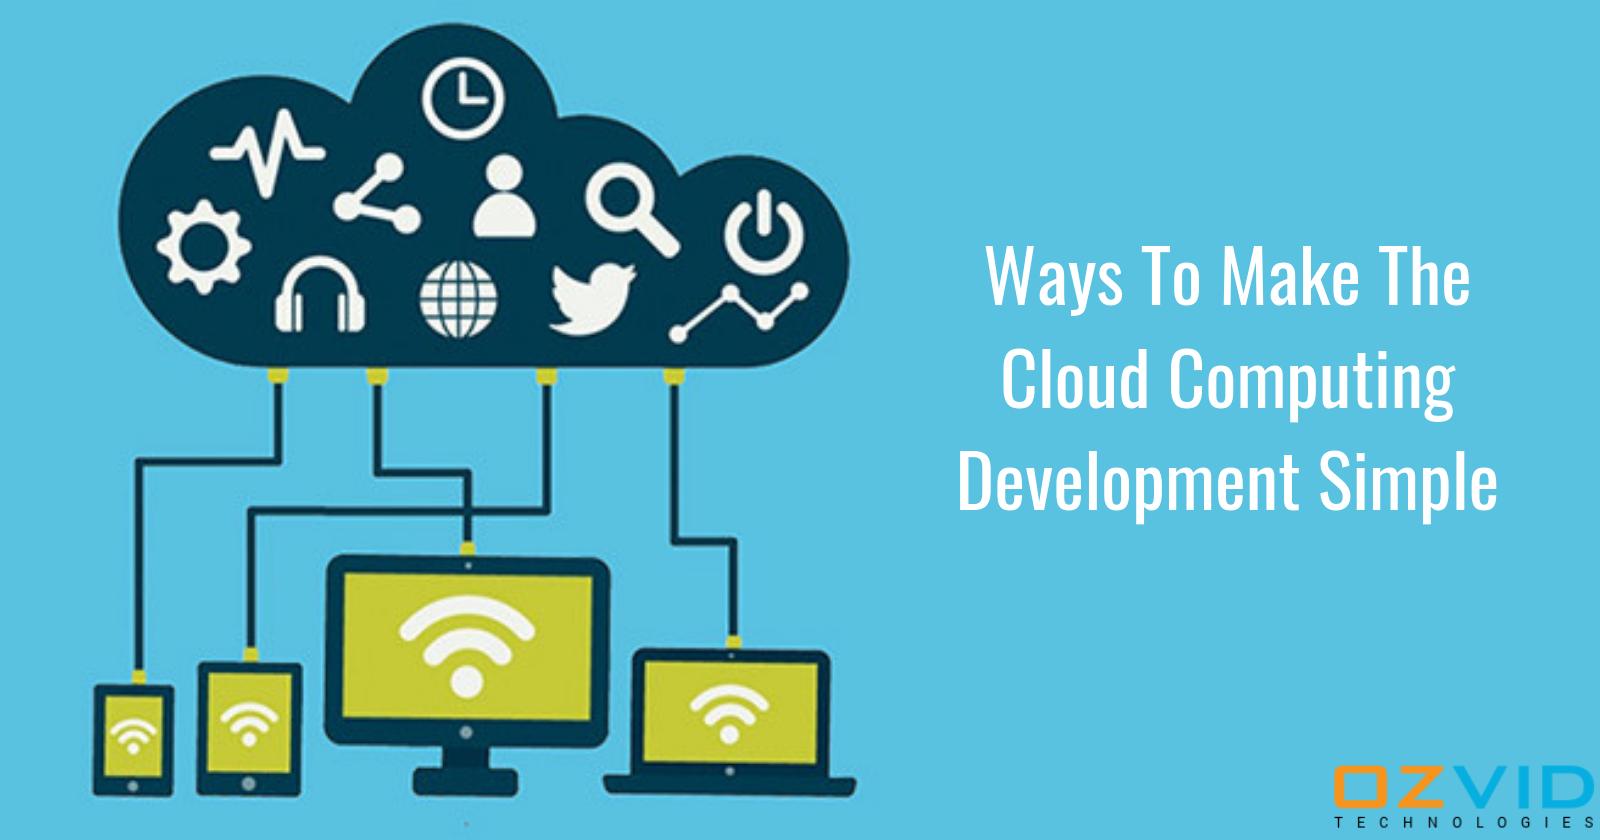 Ways To Make The Cloud Computing Development Simple